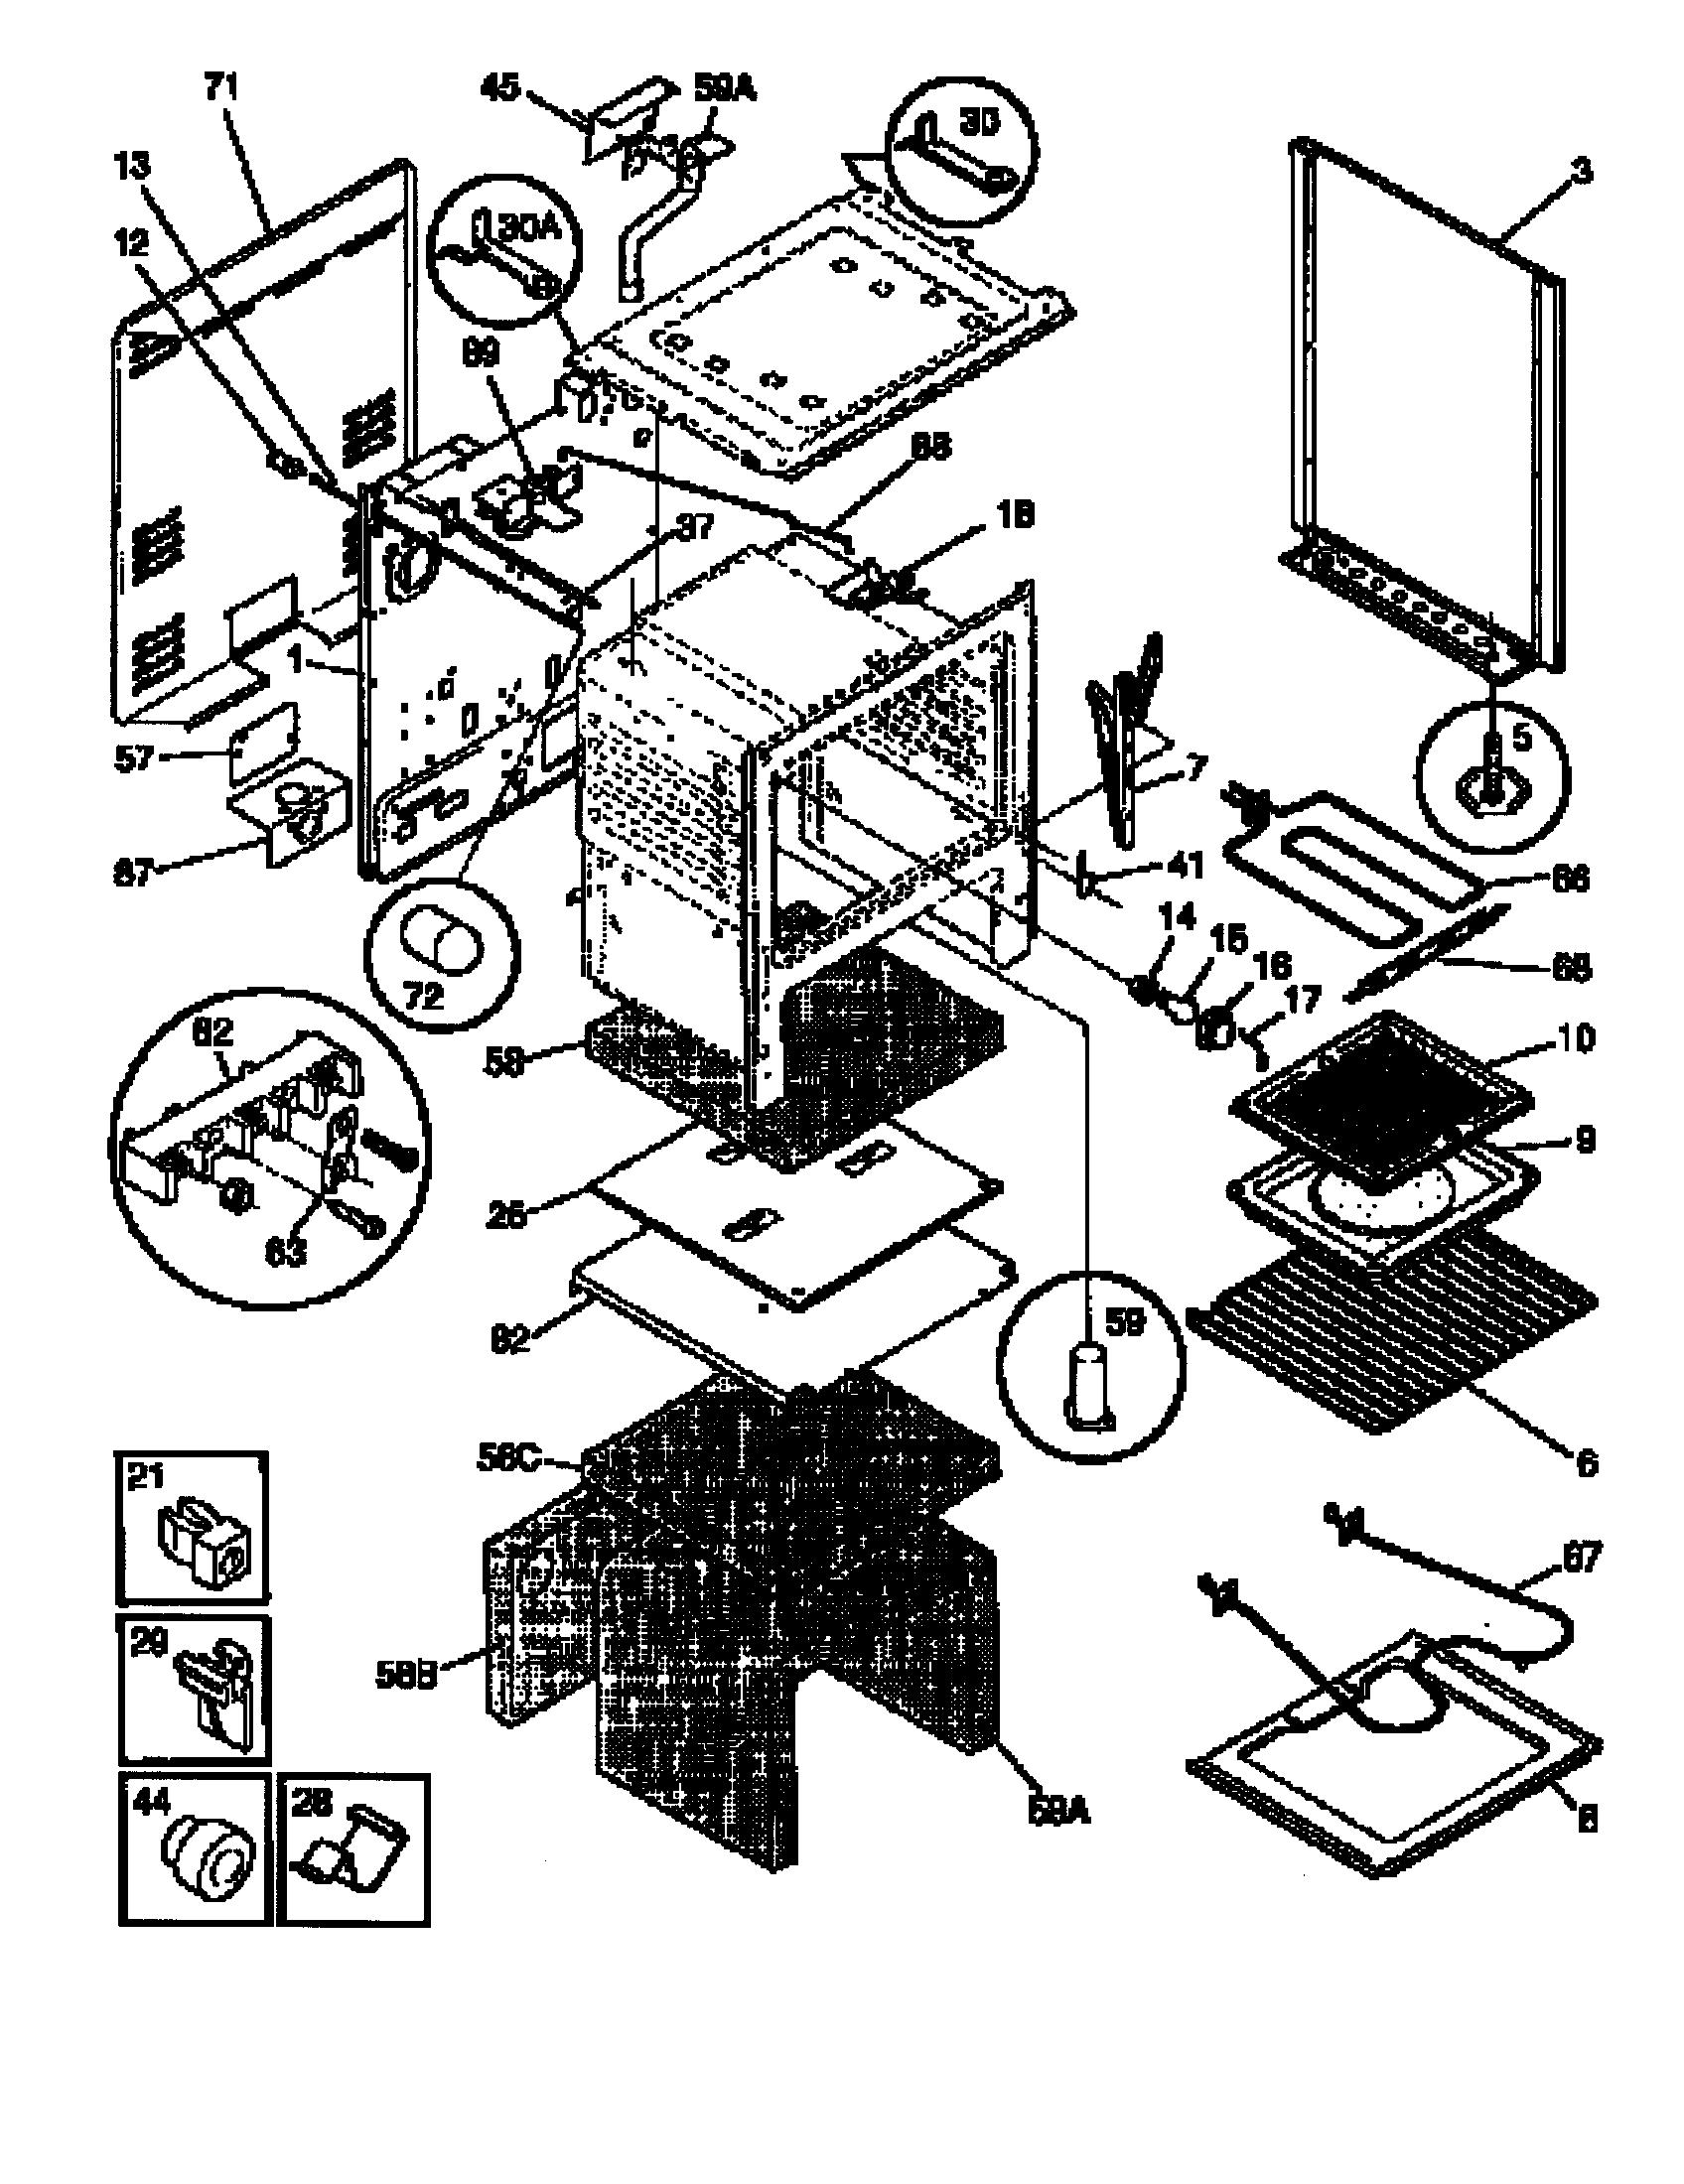 Frigidaire Fef367catb Electric Range Timer Manual Guide